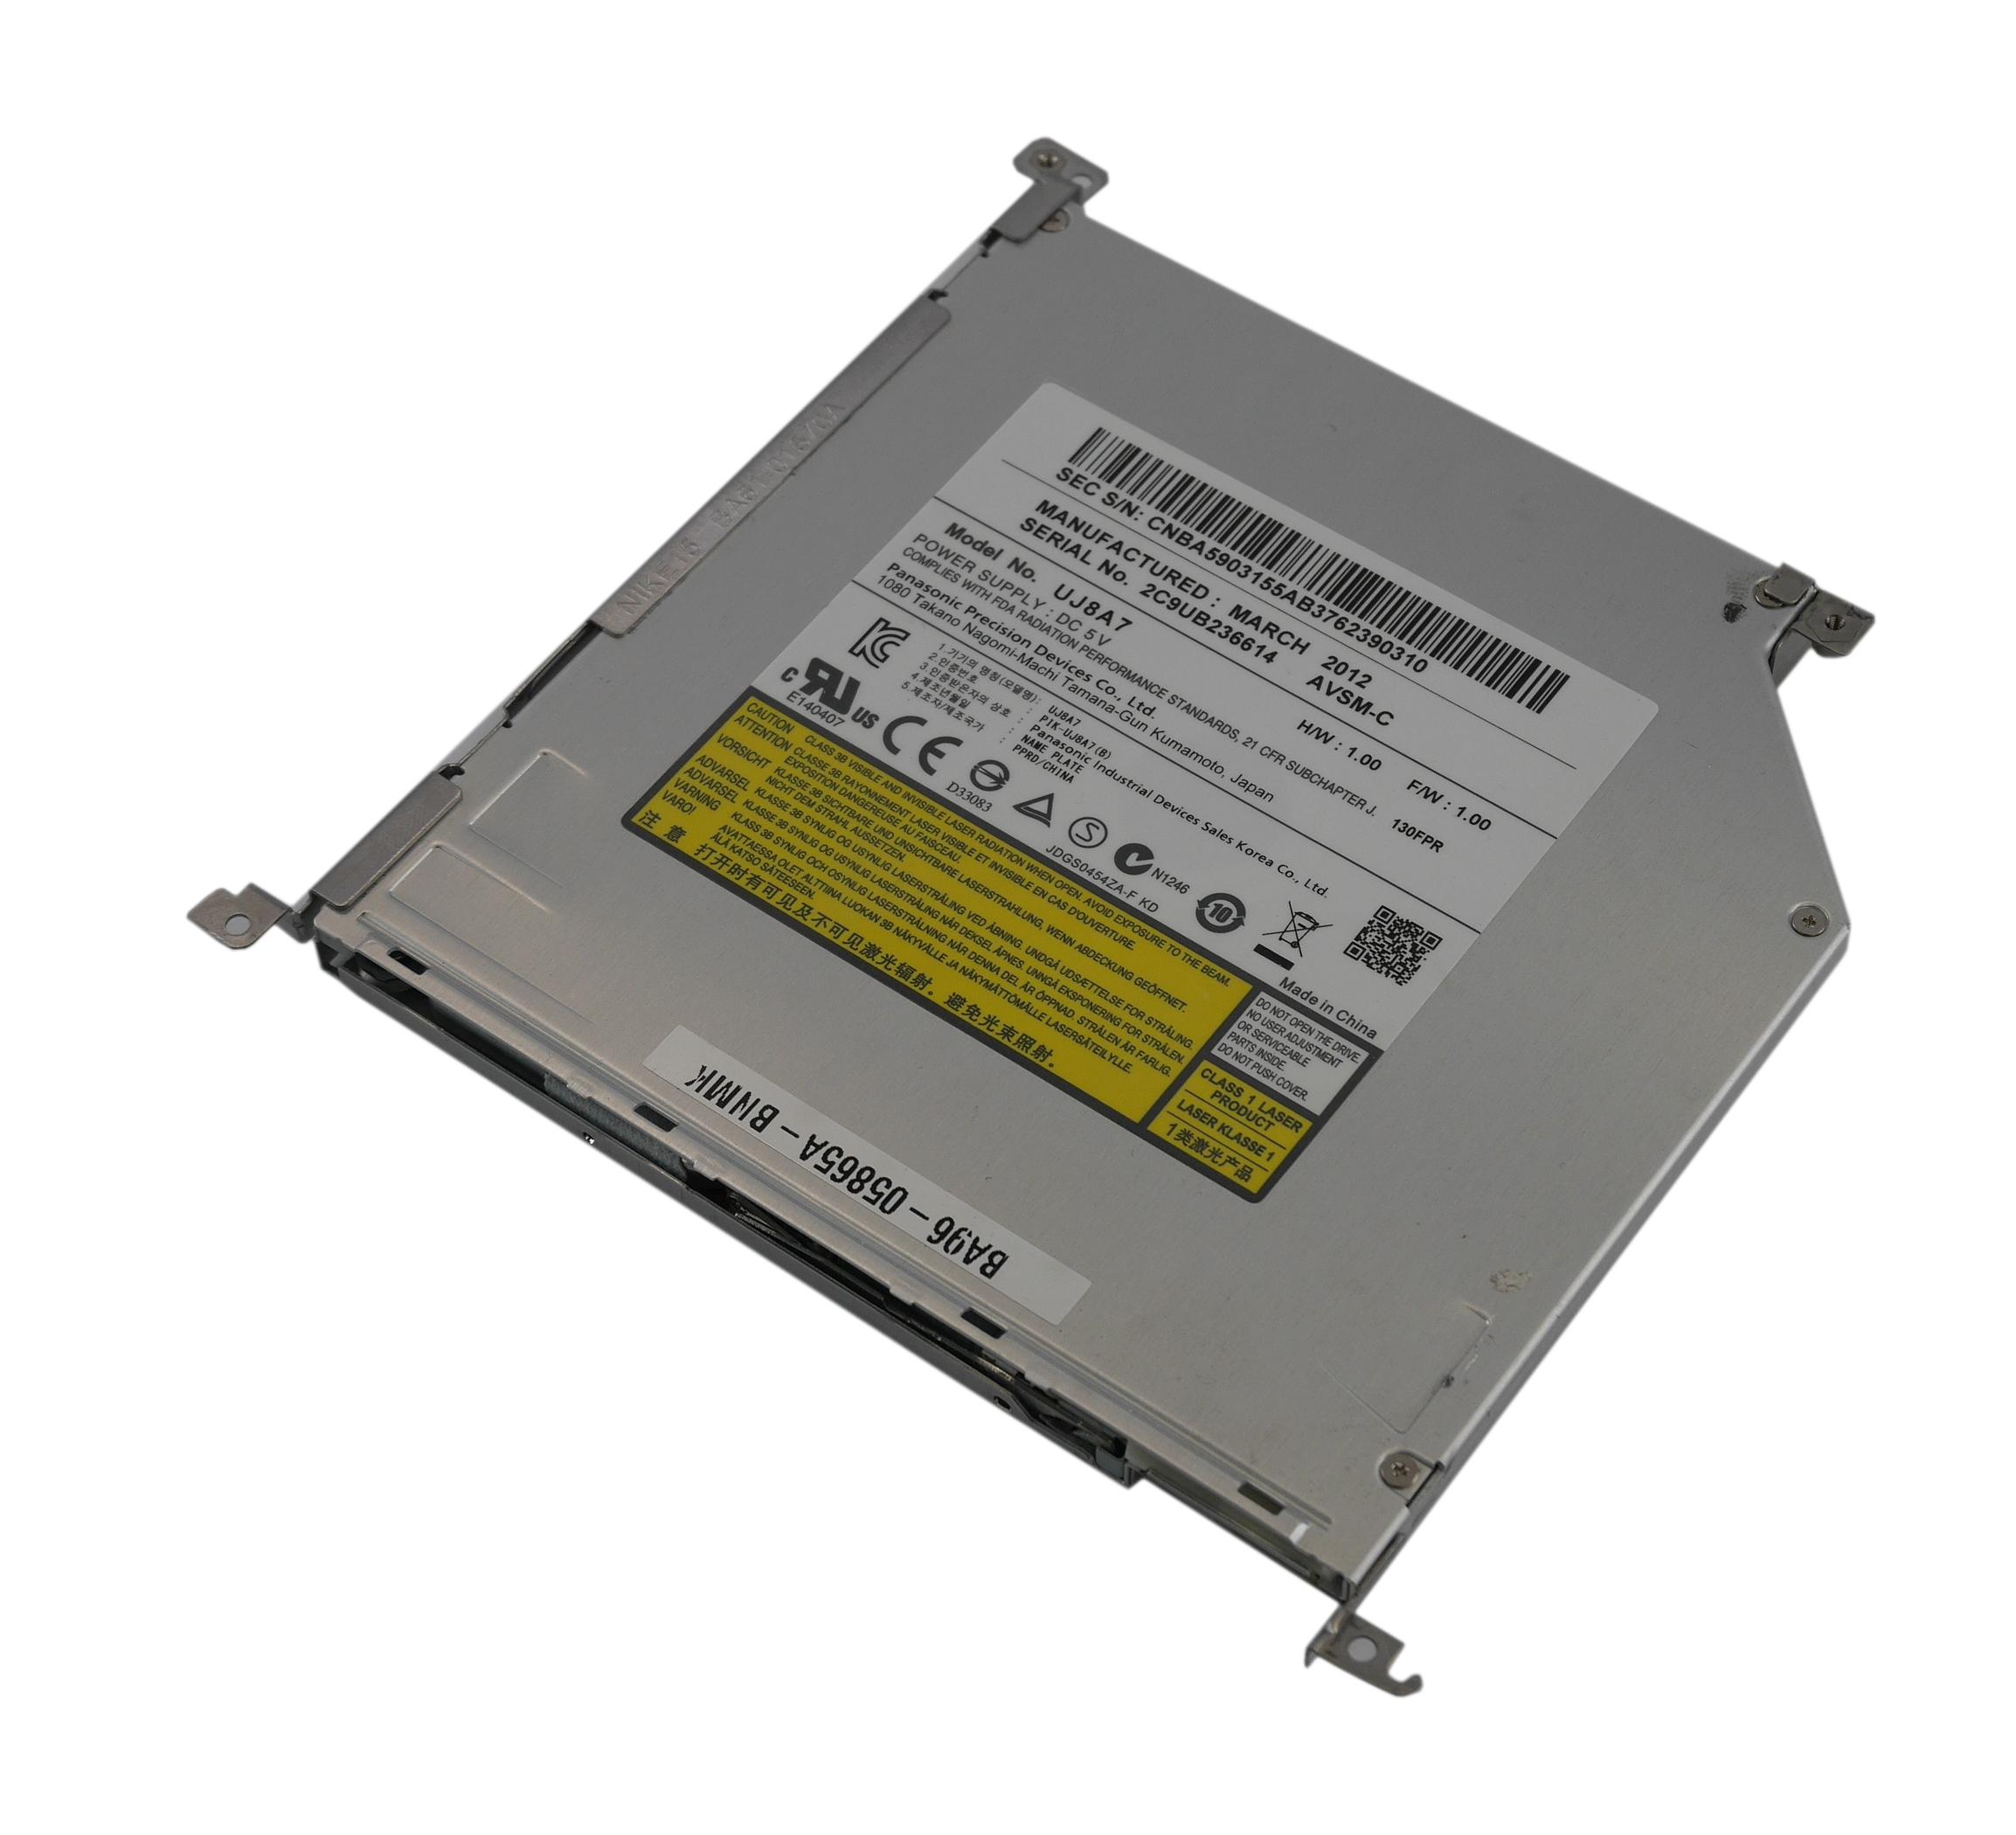 Samsung BA96-05865A-BNMK NP700Z5C Slot-Load DVD-RW SATA Drive with Bracket